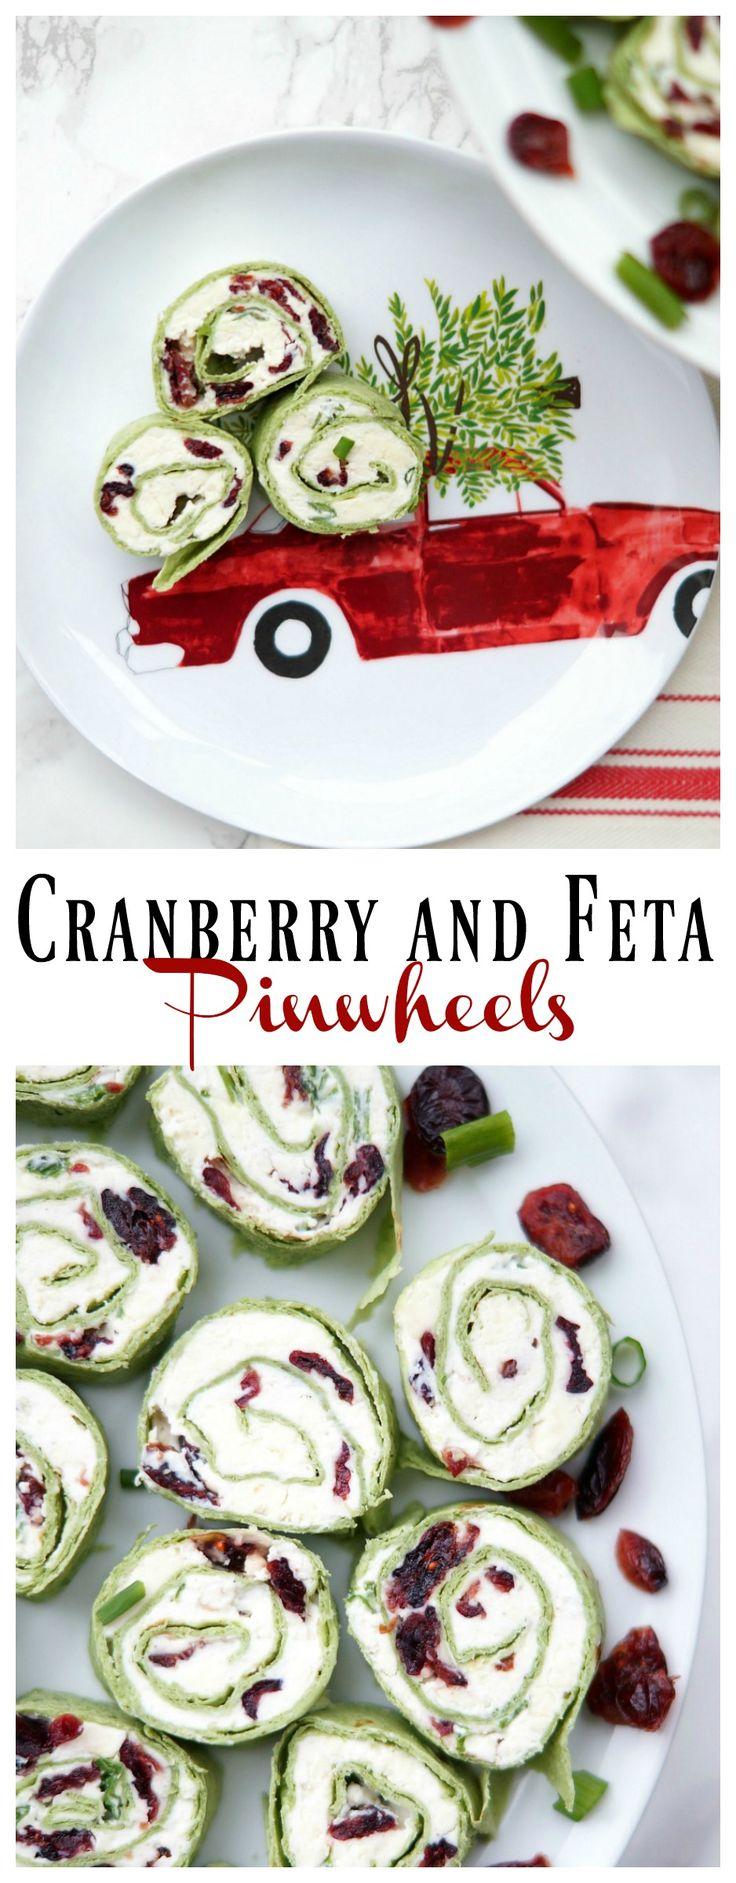 Cranberry and Feta Pinwheels